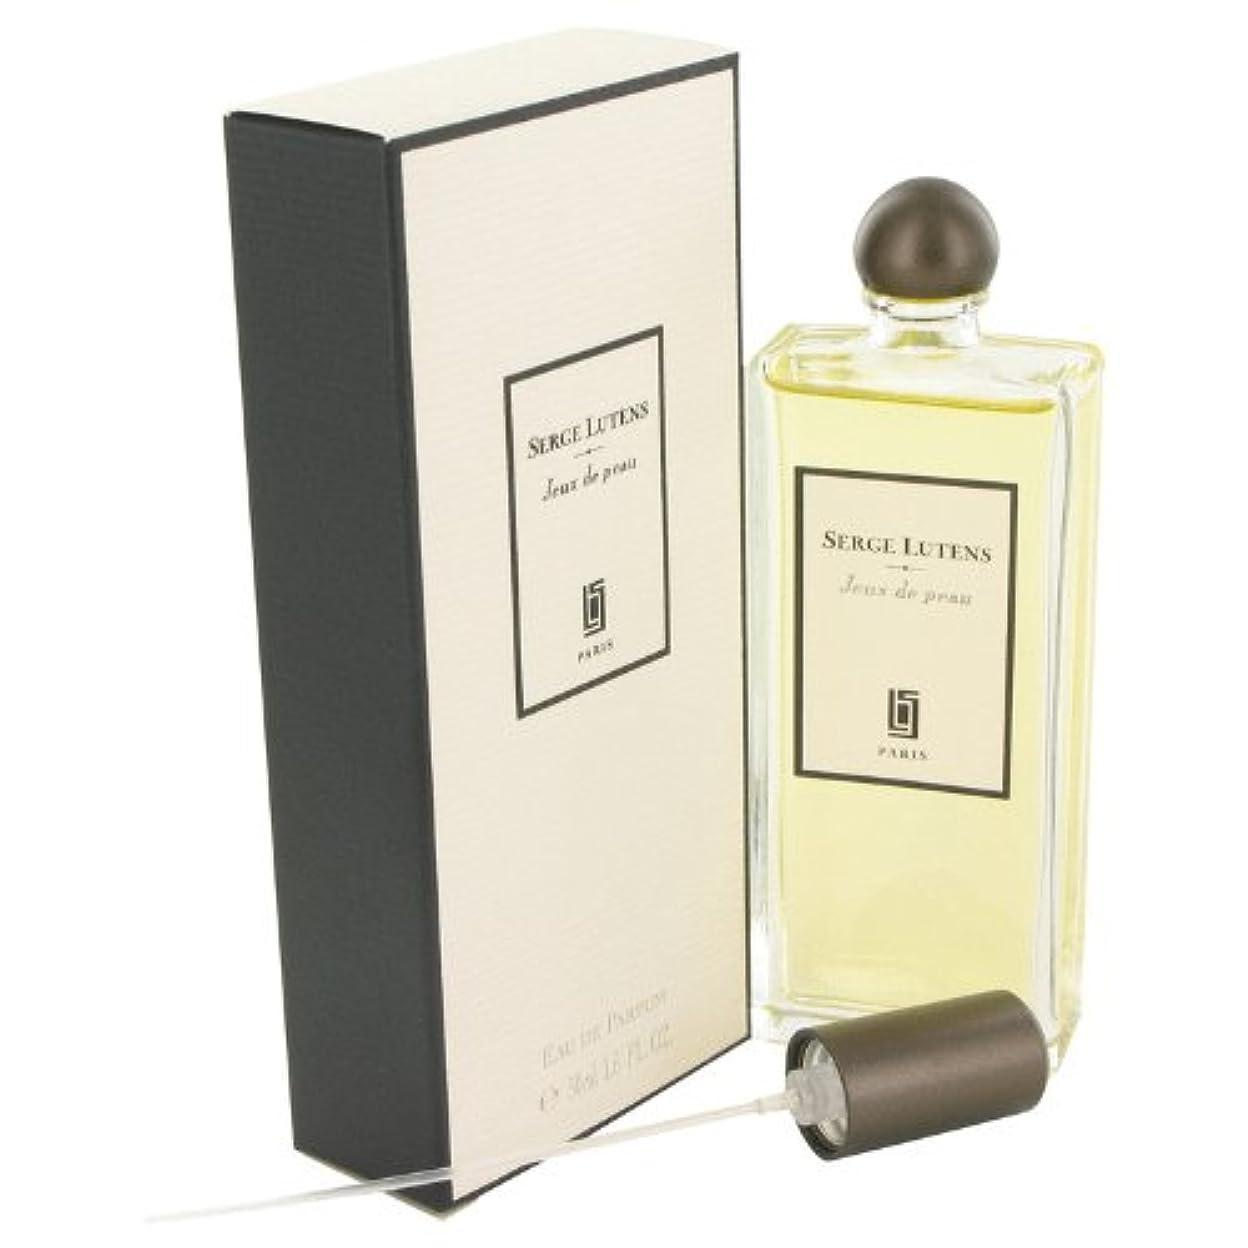 彼女はスイス人意見Jeux De Peau Eau De Parfum Spray (unisex) By Serge Lutens